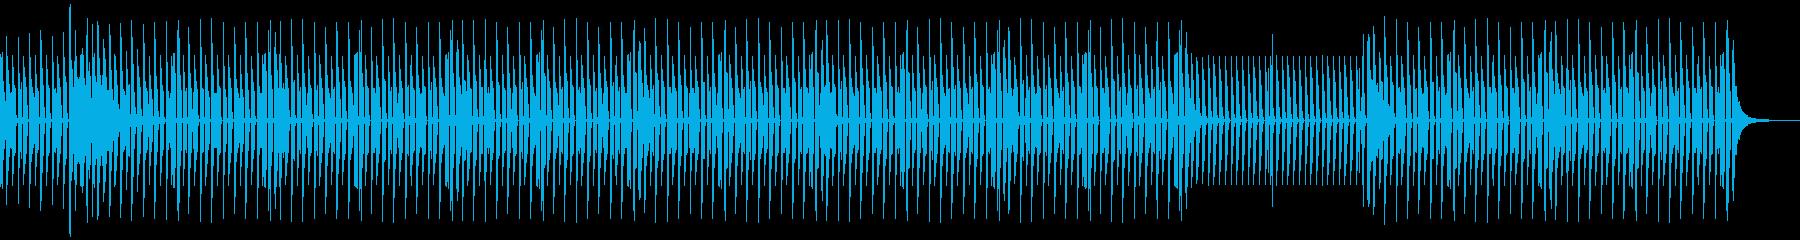 News5 ドラムのみ16bit48kの再生済みの波形